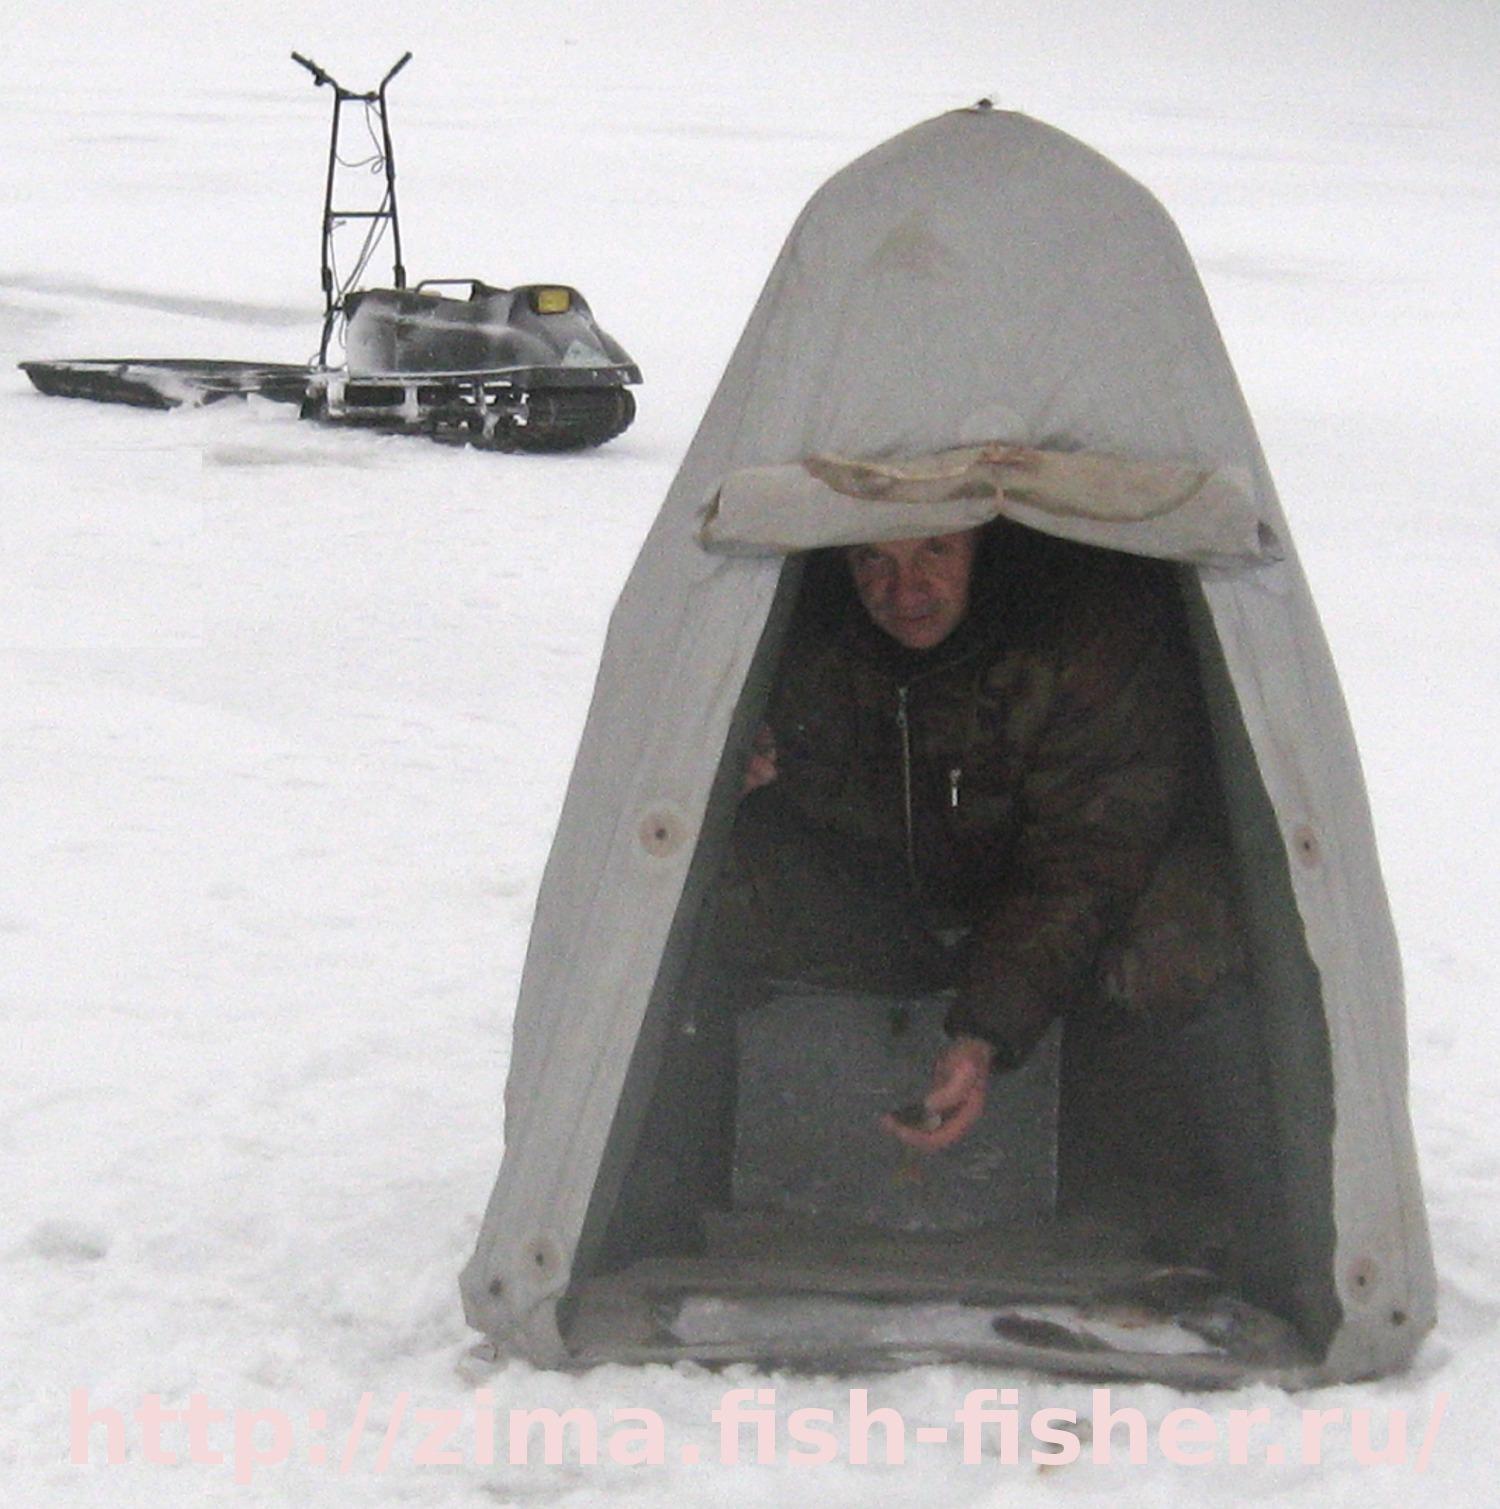 палатка для зимней рыбалки желтая